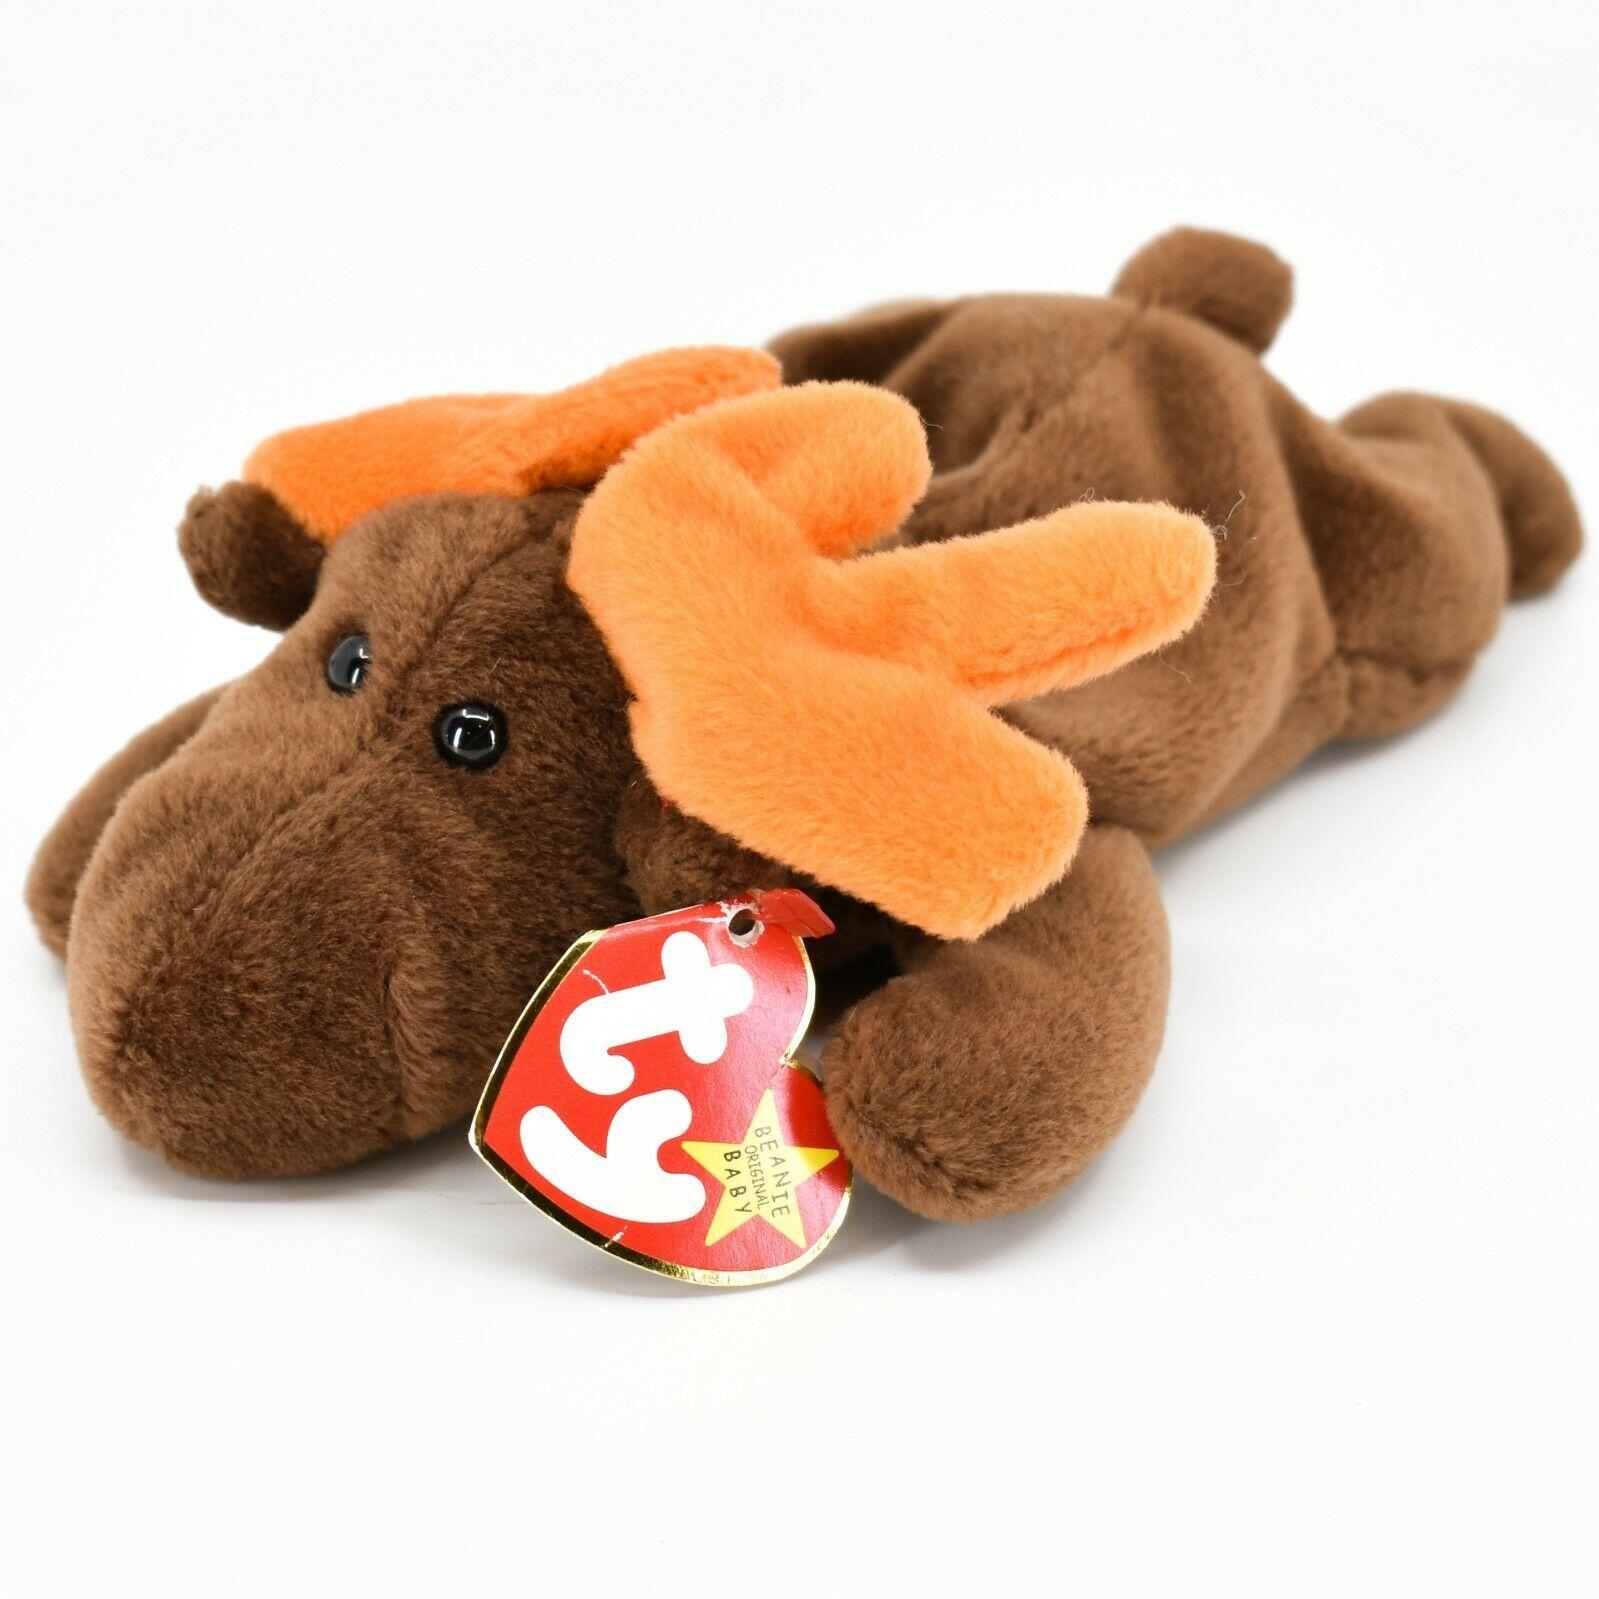 1993 TY Beanie Baby Original Chocolate the Moose PVC Beanbag Plus Toy Doll